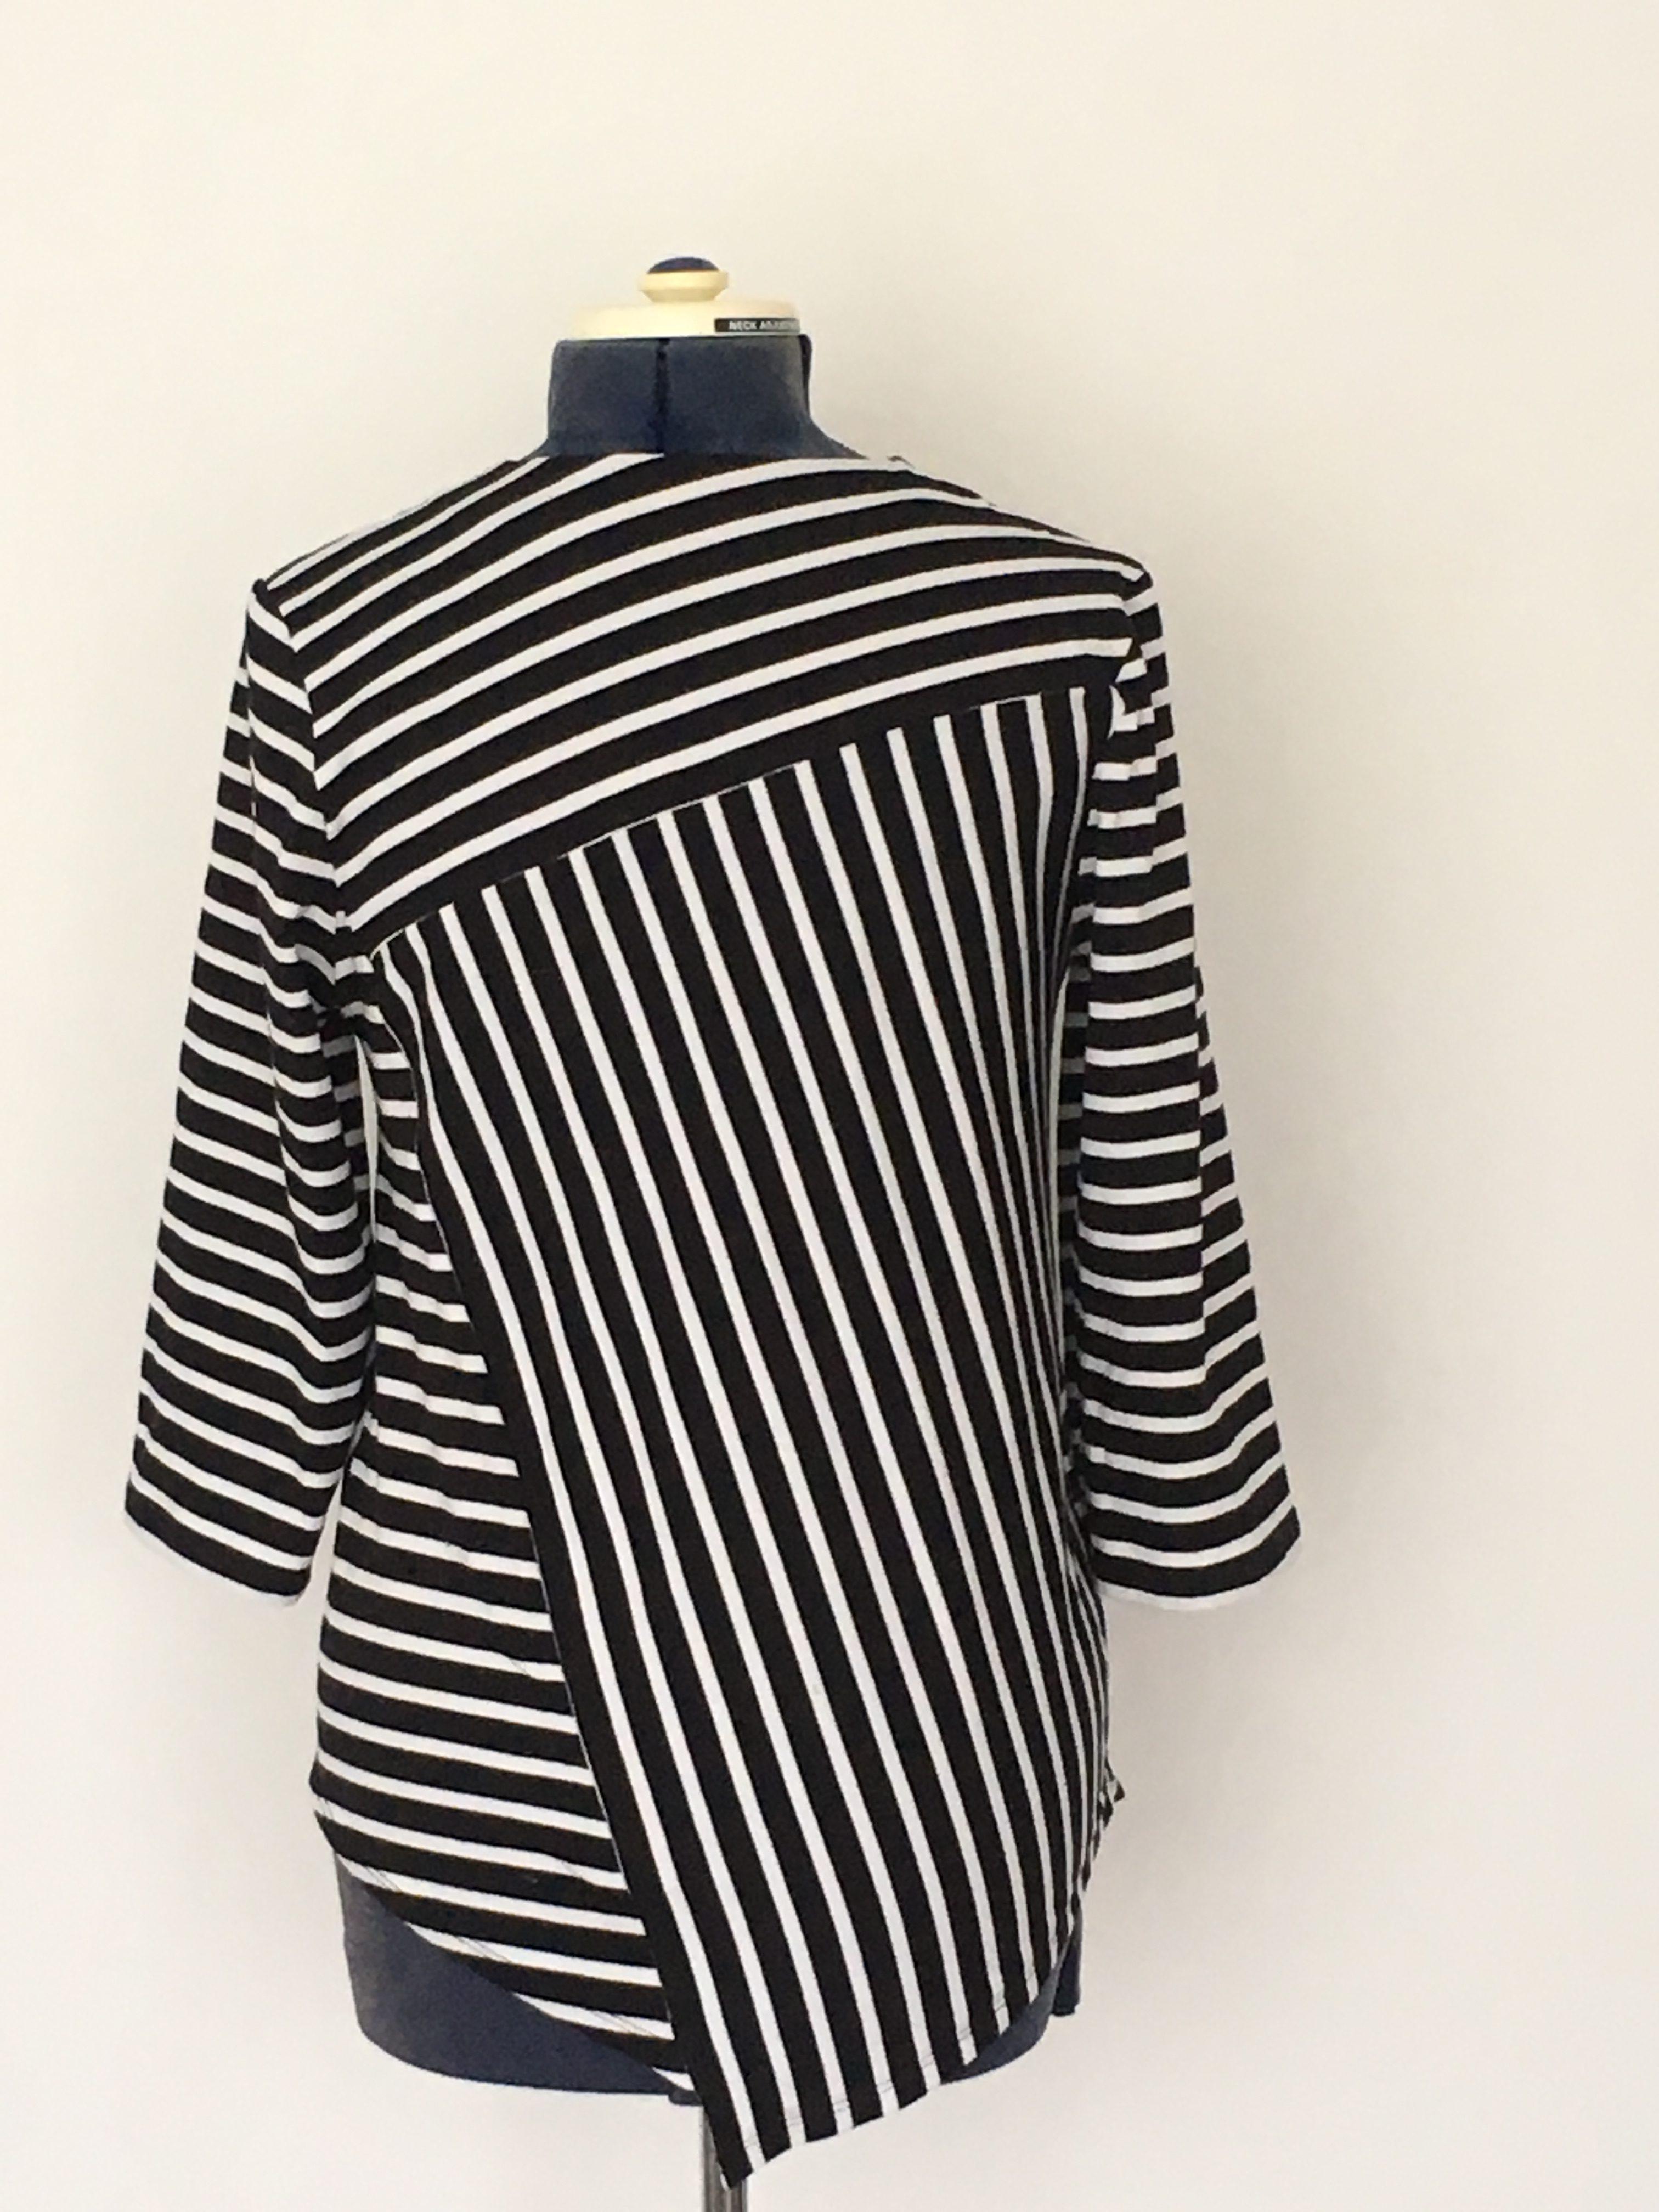 Homemade Black White striped asymmetric cut Top